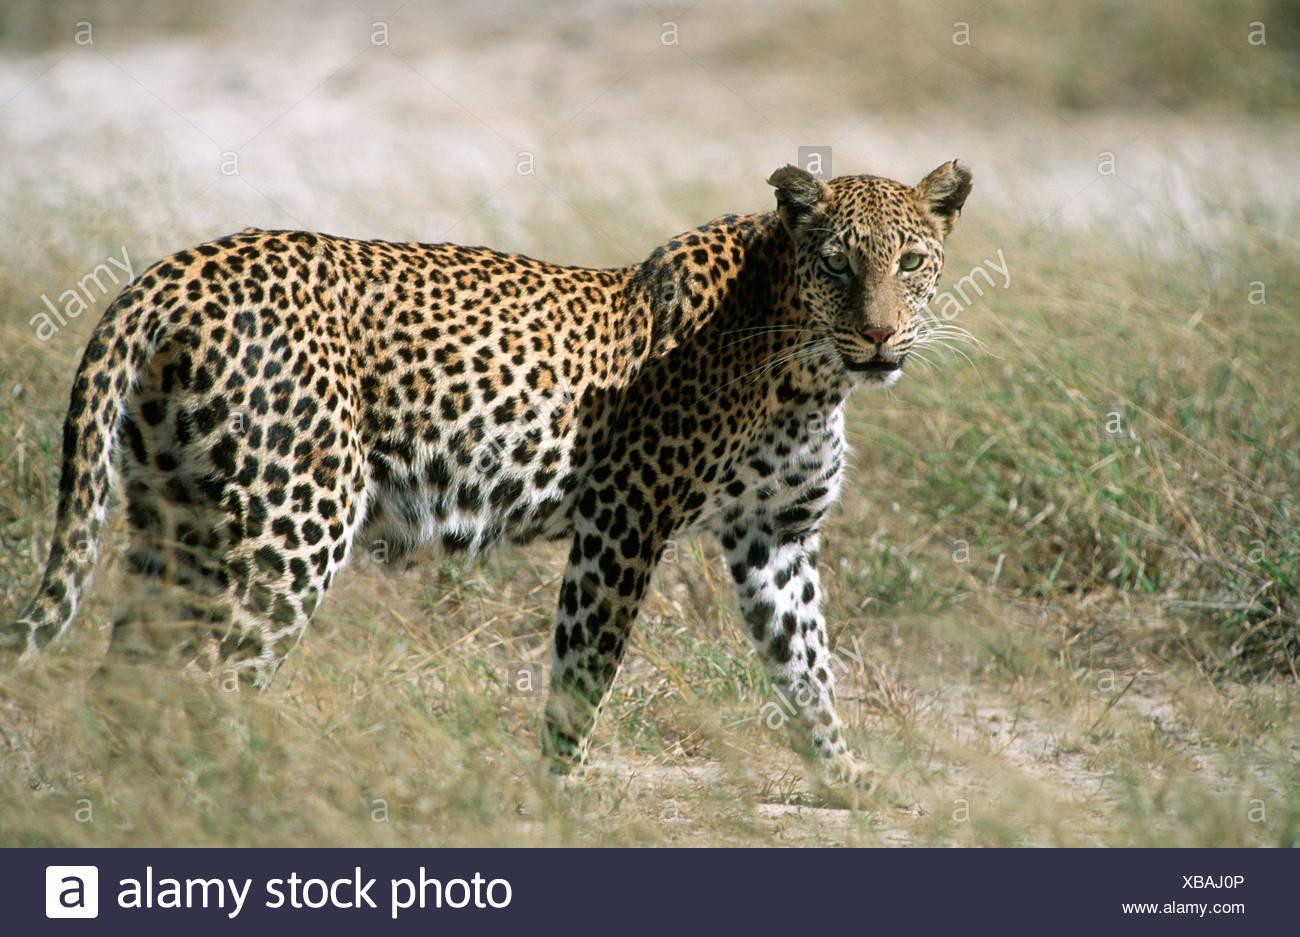 Portrait of a Leopard (Panthera pardus) in the Bushveld - Stock Image